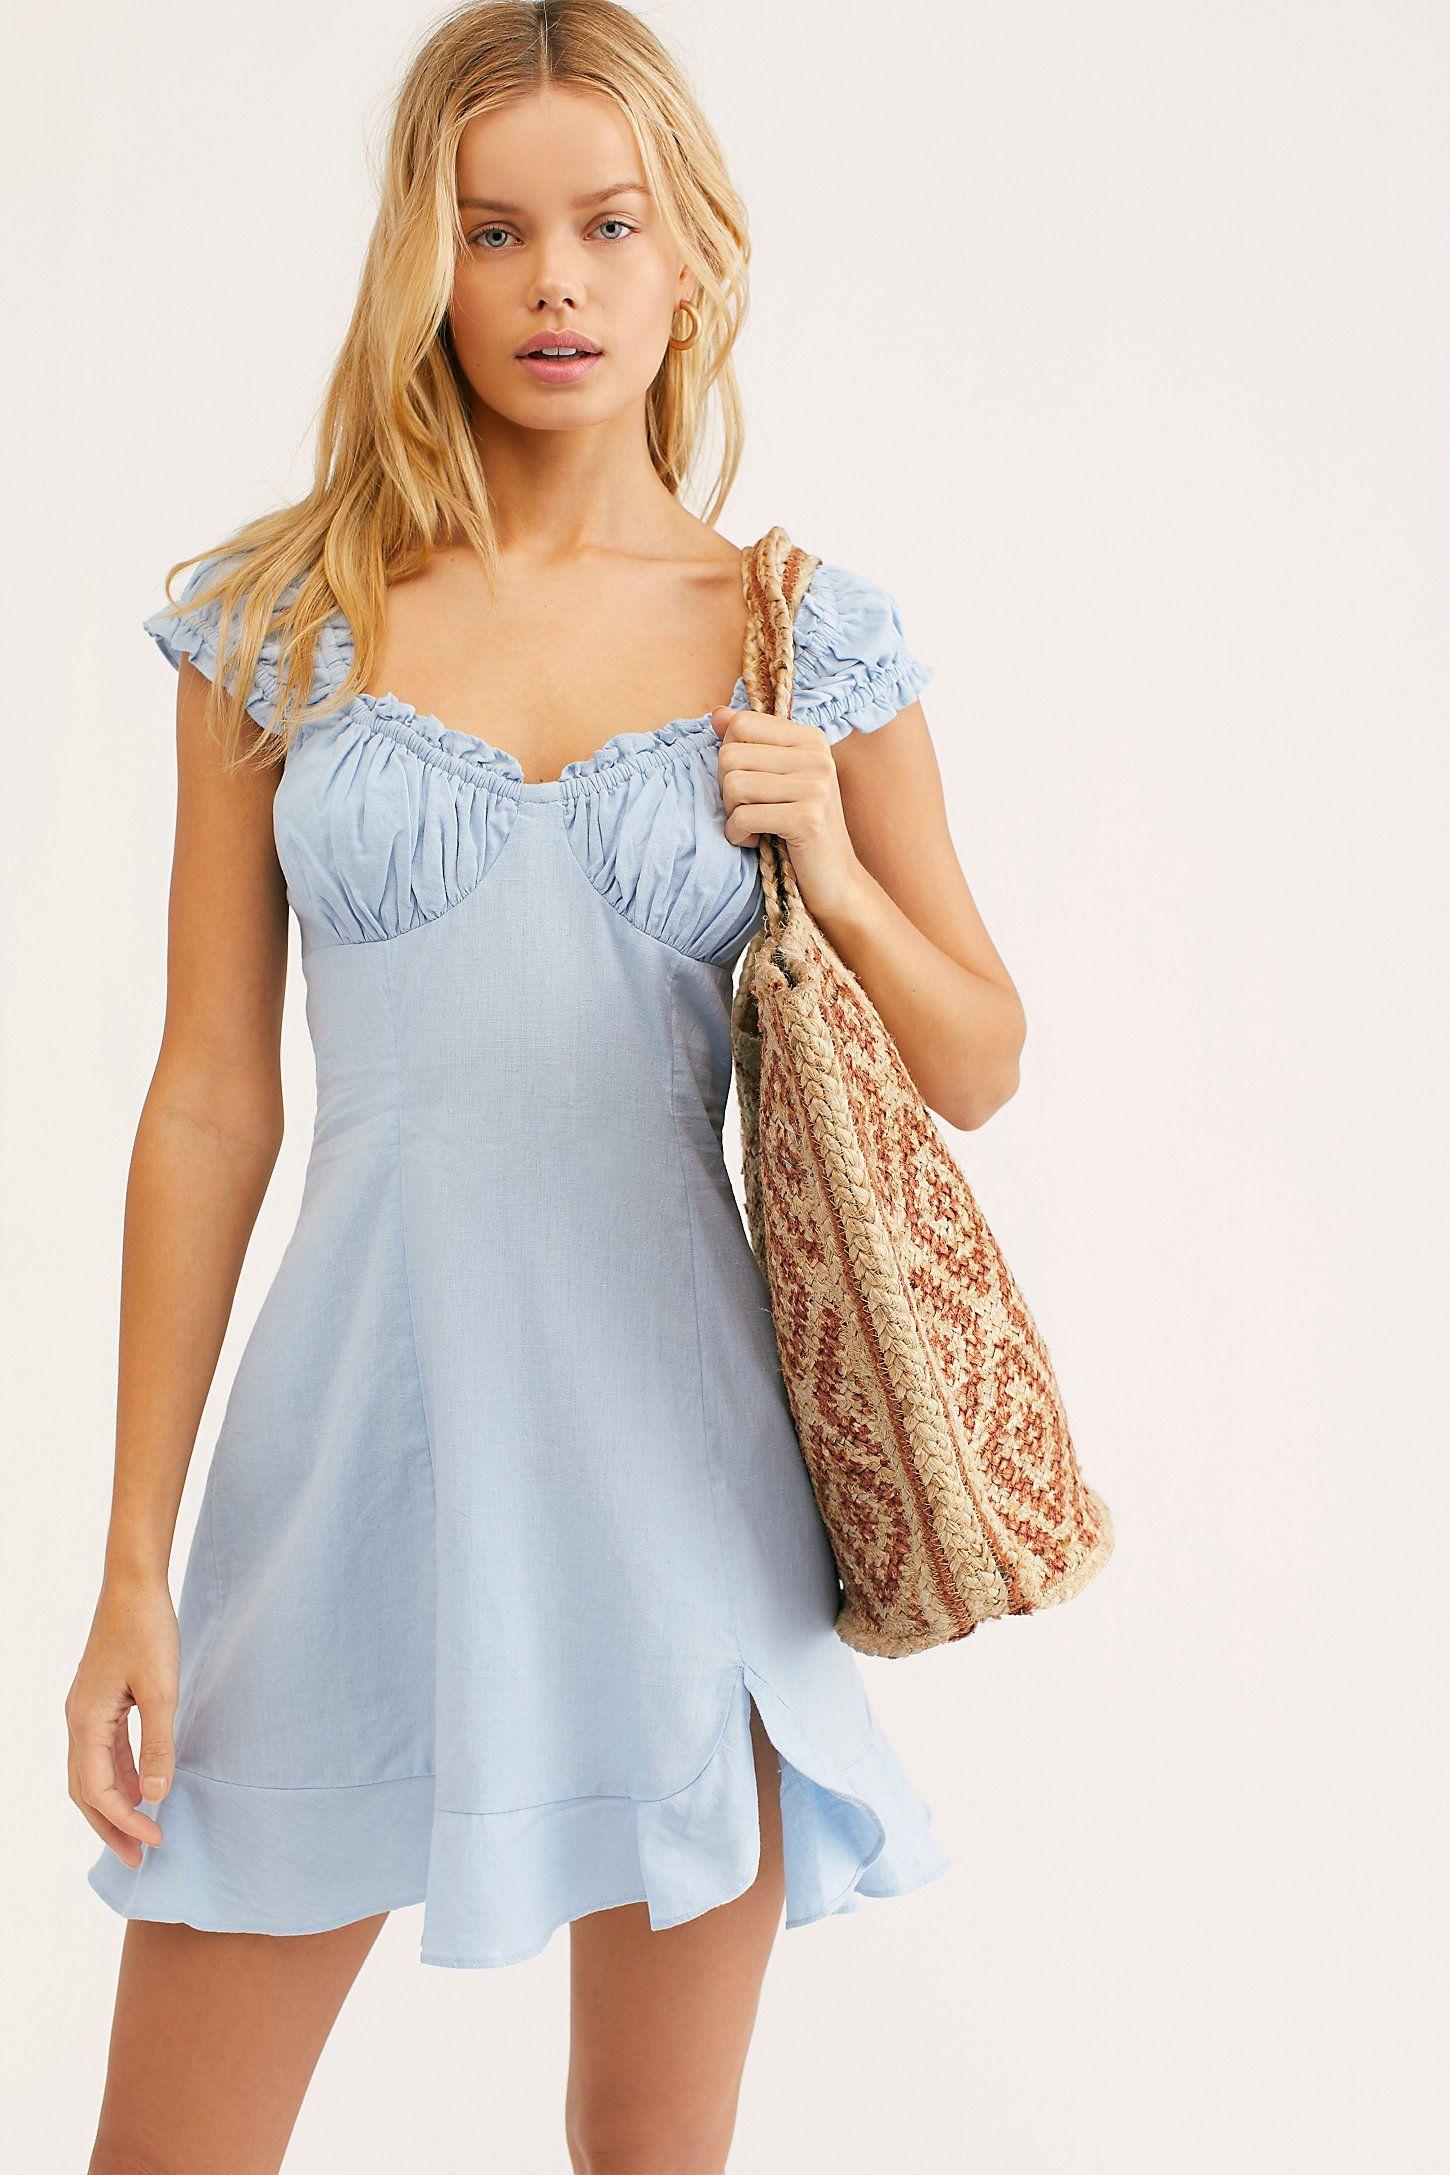 7047aad9633c6 Like A Lady Mini Dress in 2019   Summer Fashion 2019   Dresses ...